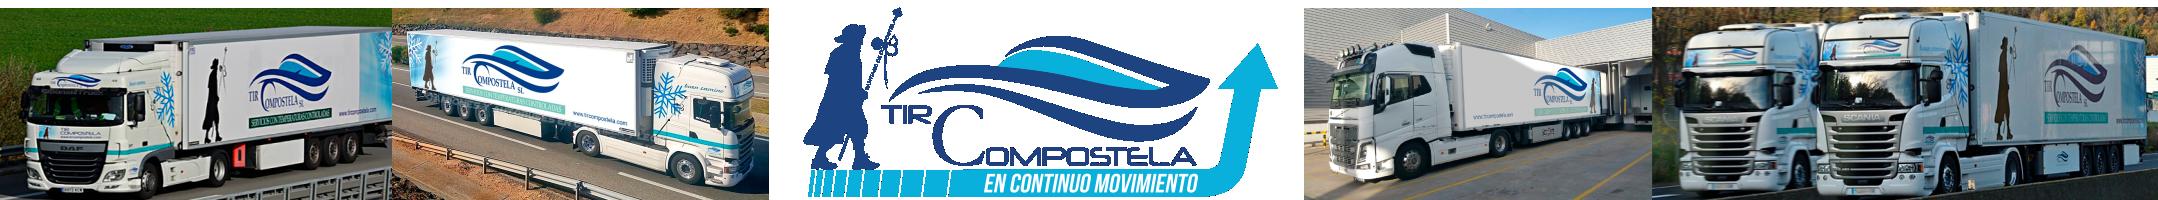 TIR Compostela